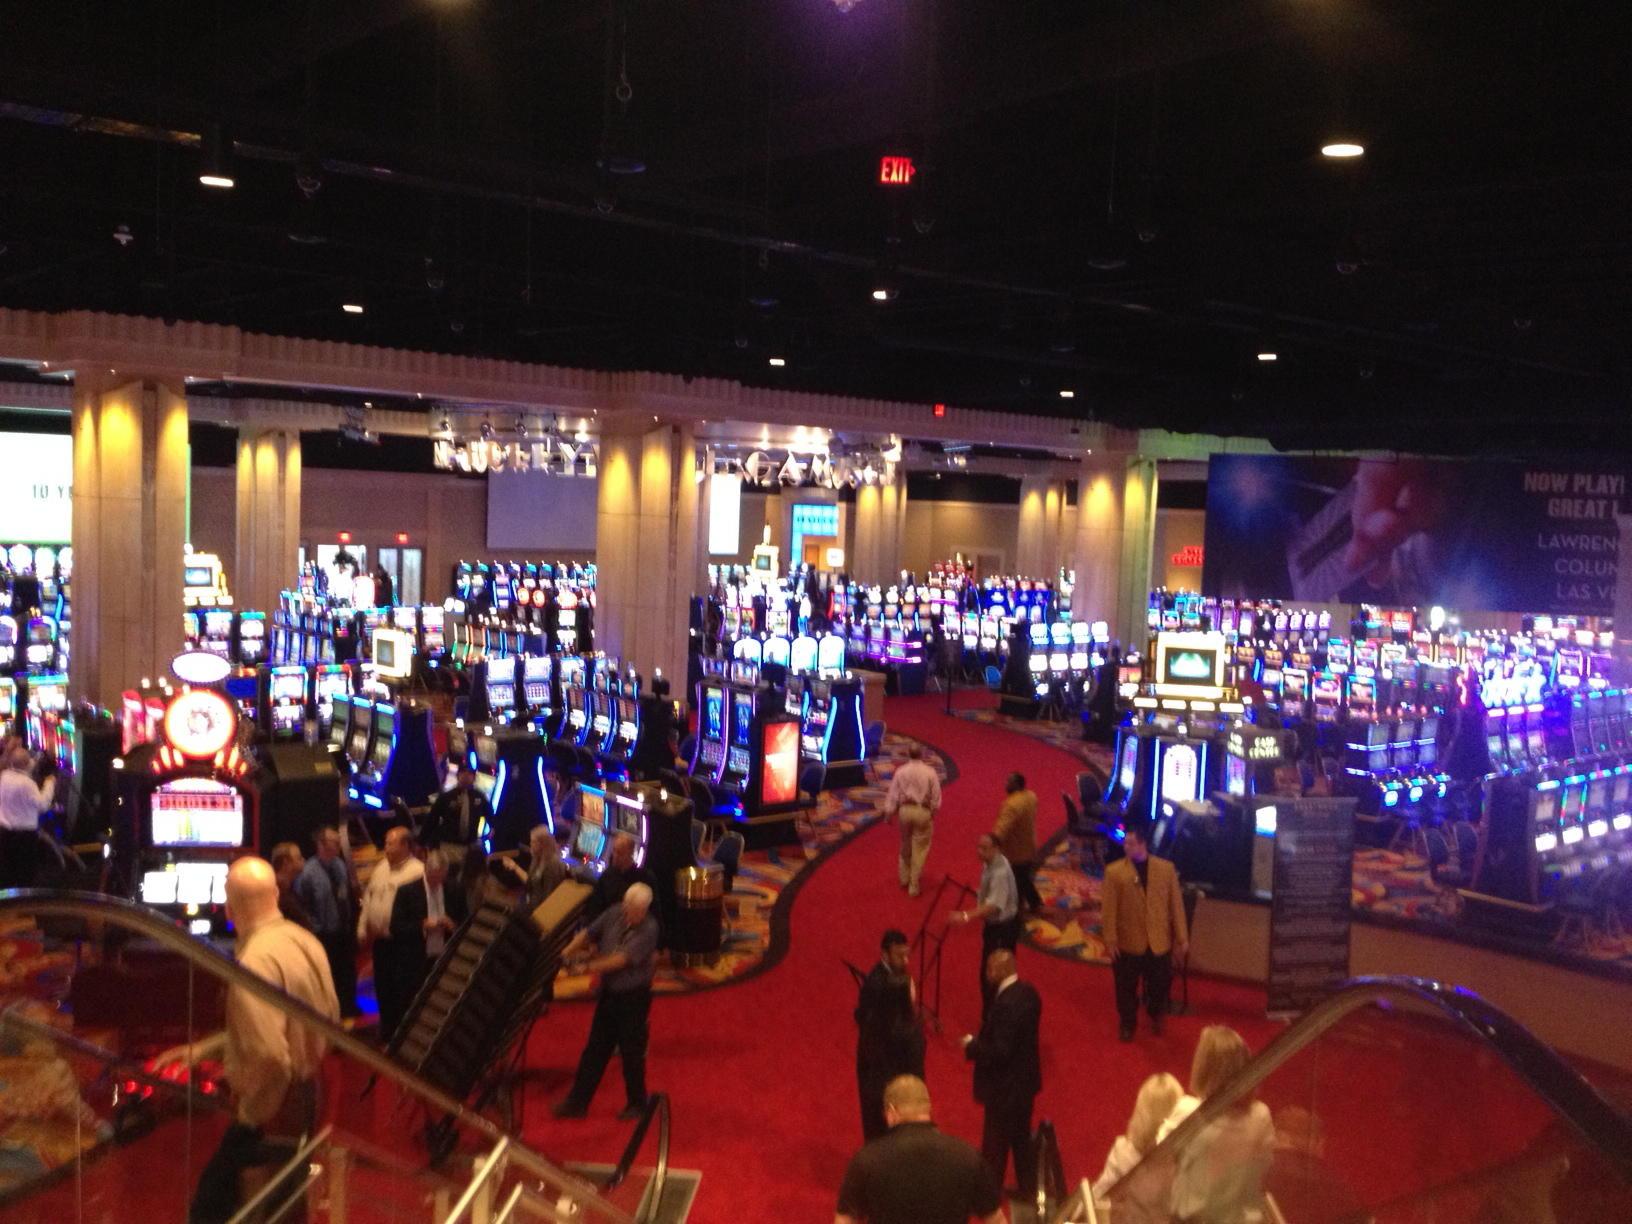 Dayton Raceway Casino